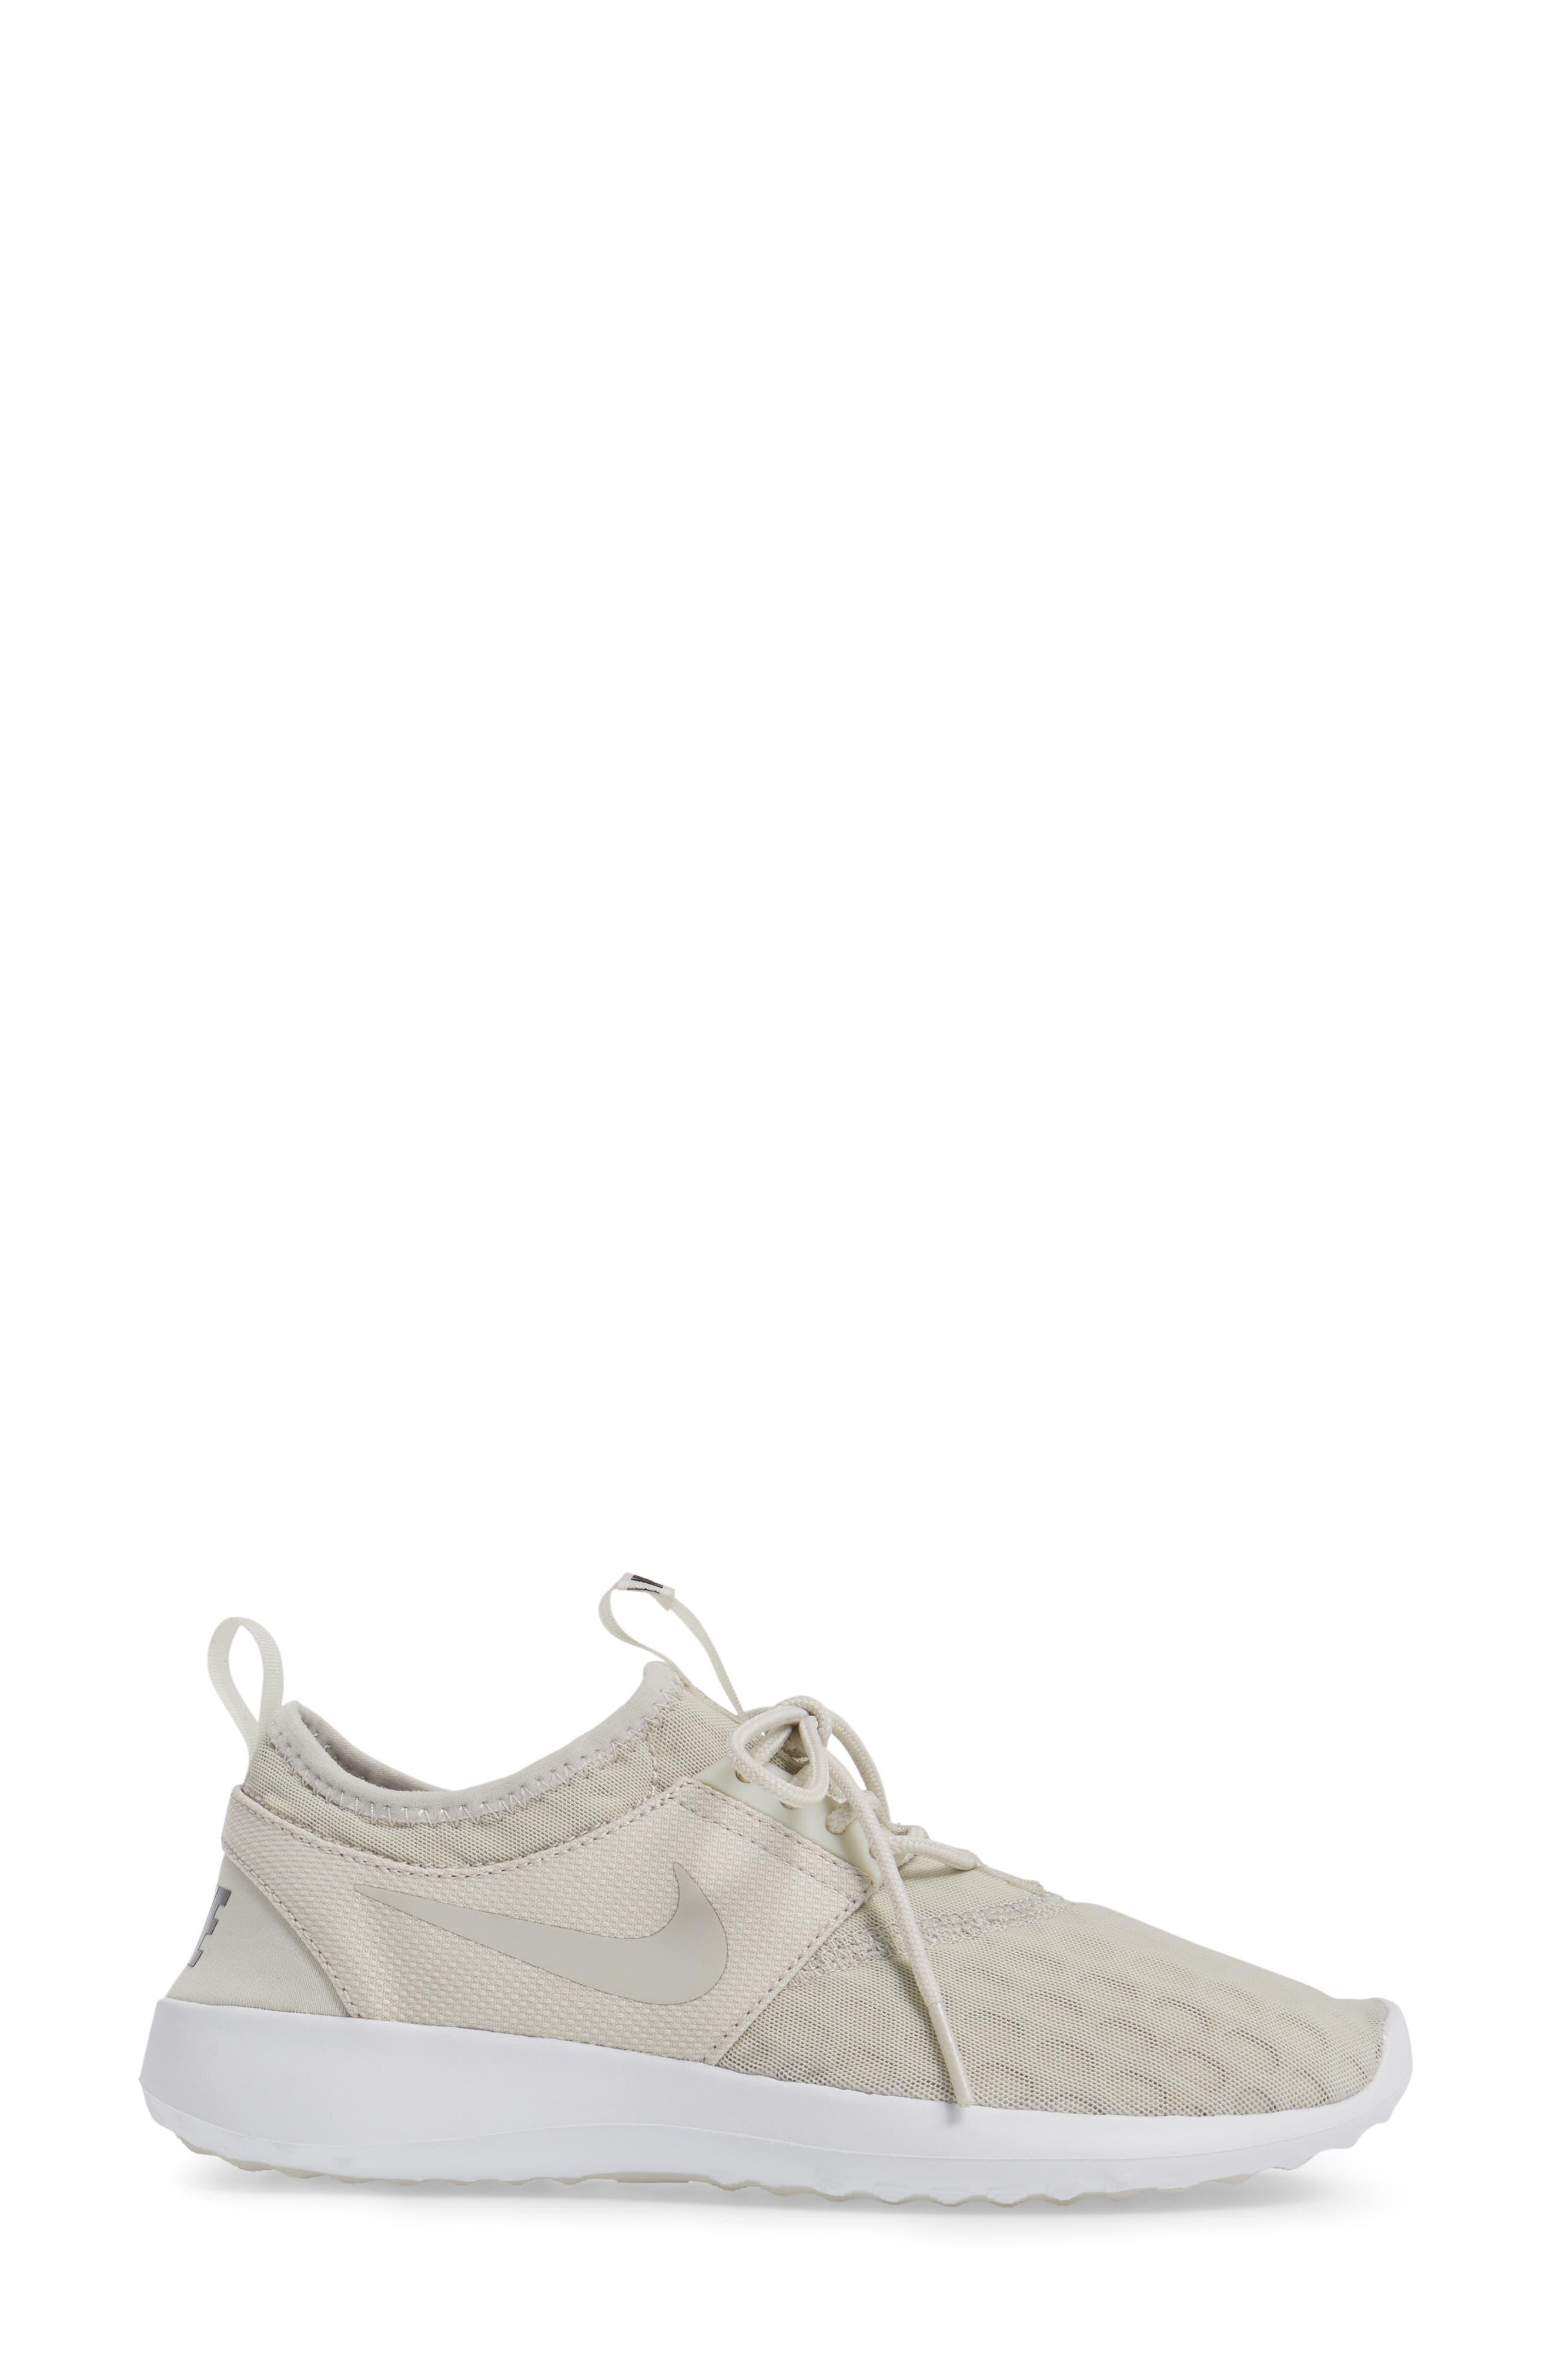 ,                             'Juvenate' Sneaker,                             Alternate thumbnail 122, color,                             251